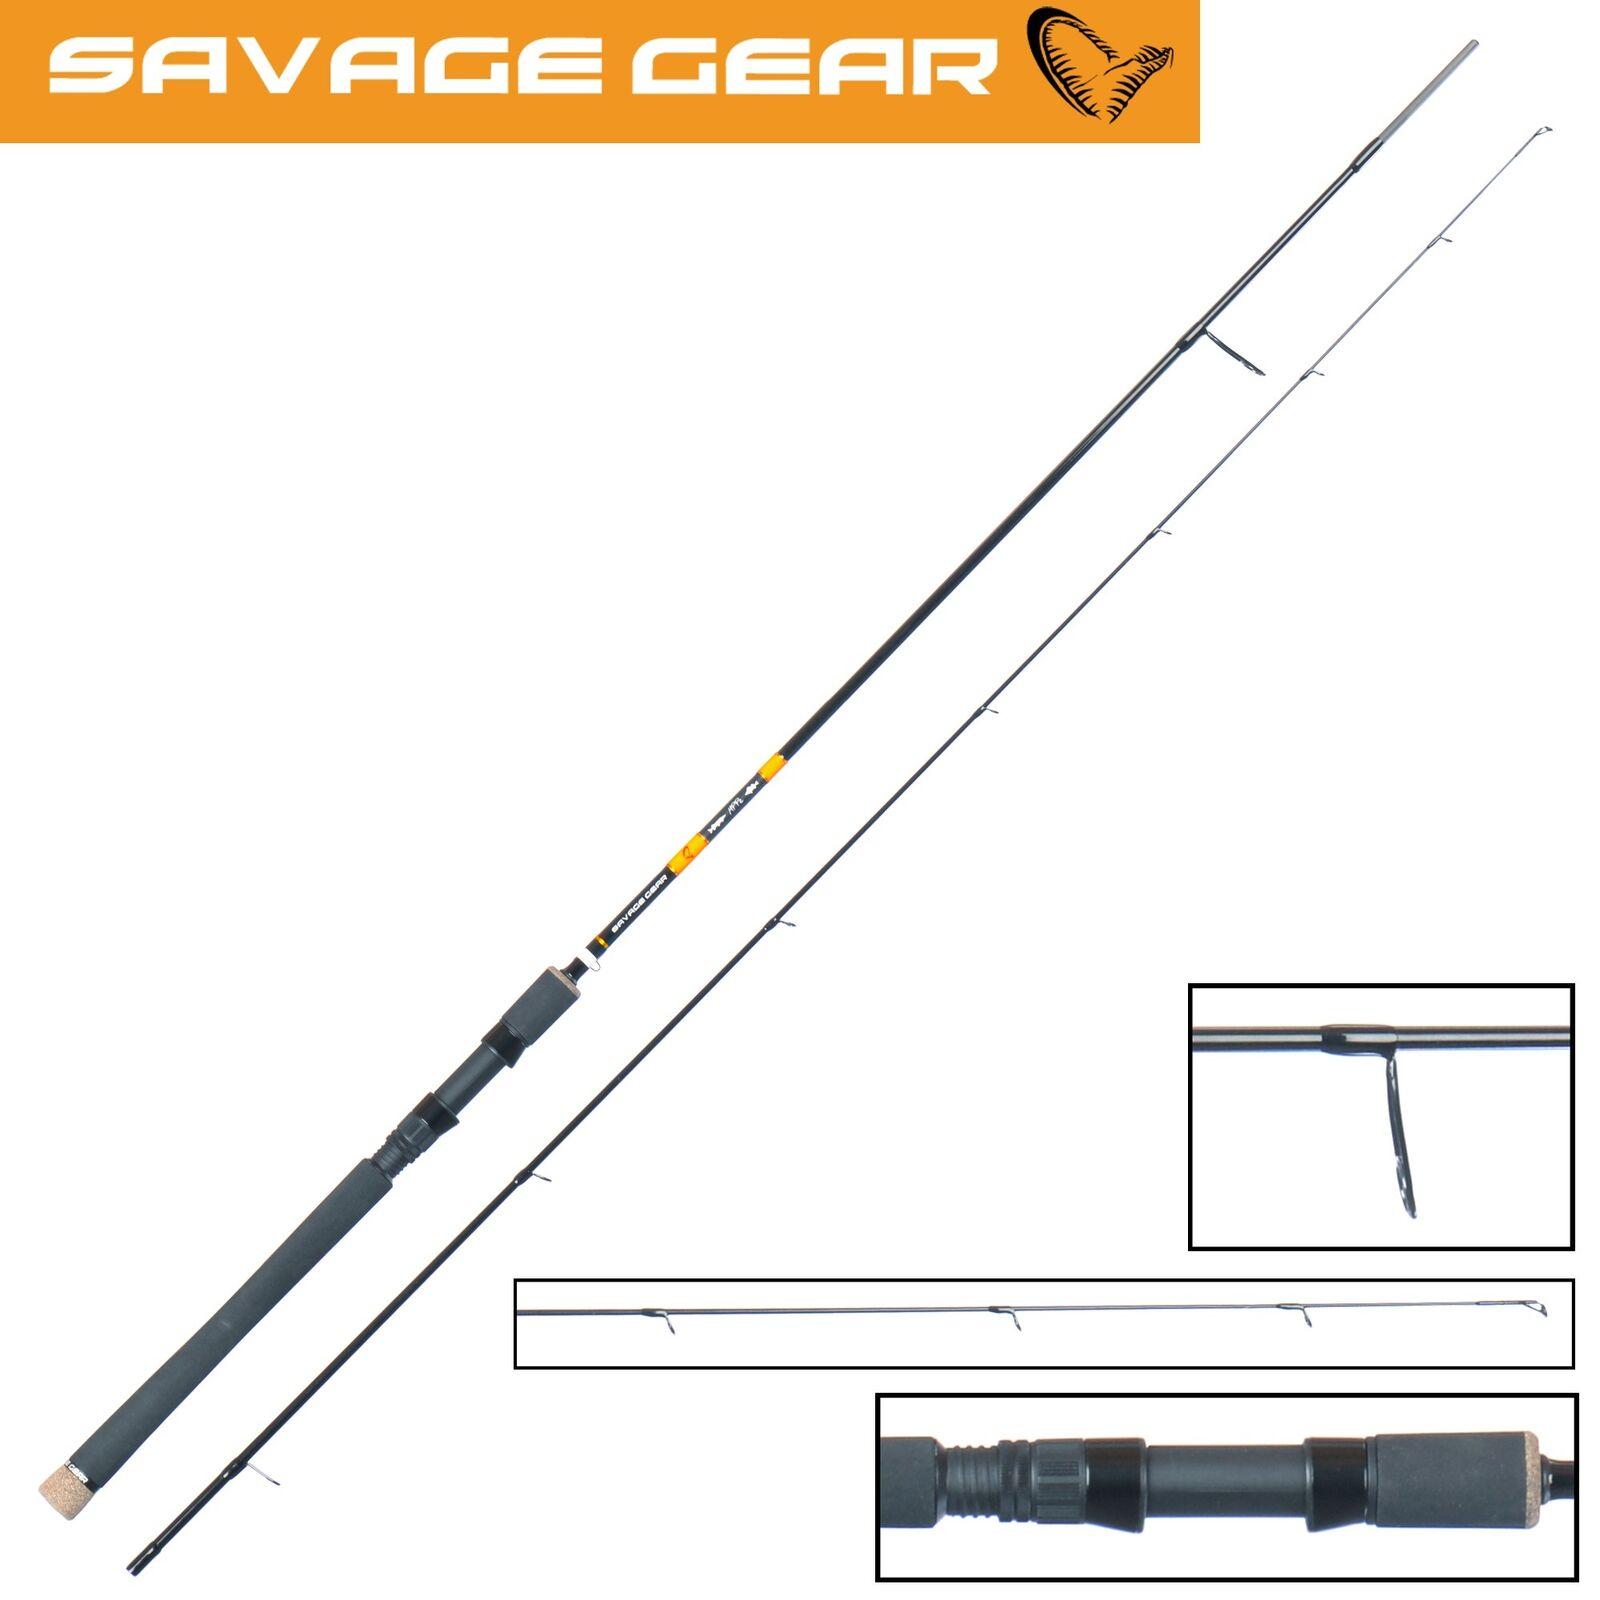 Savage Gear MPP2 Spin 221cm 7-23g - Spinnrute für Barsch, Angelrute, Blinkerrute